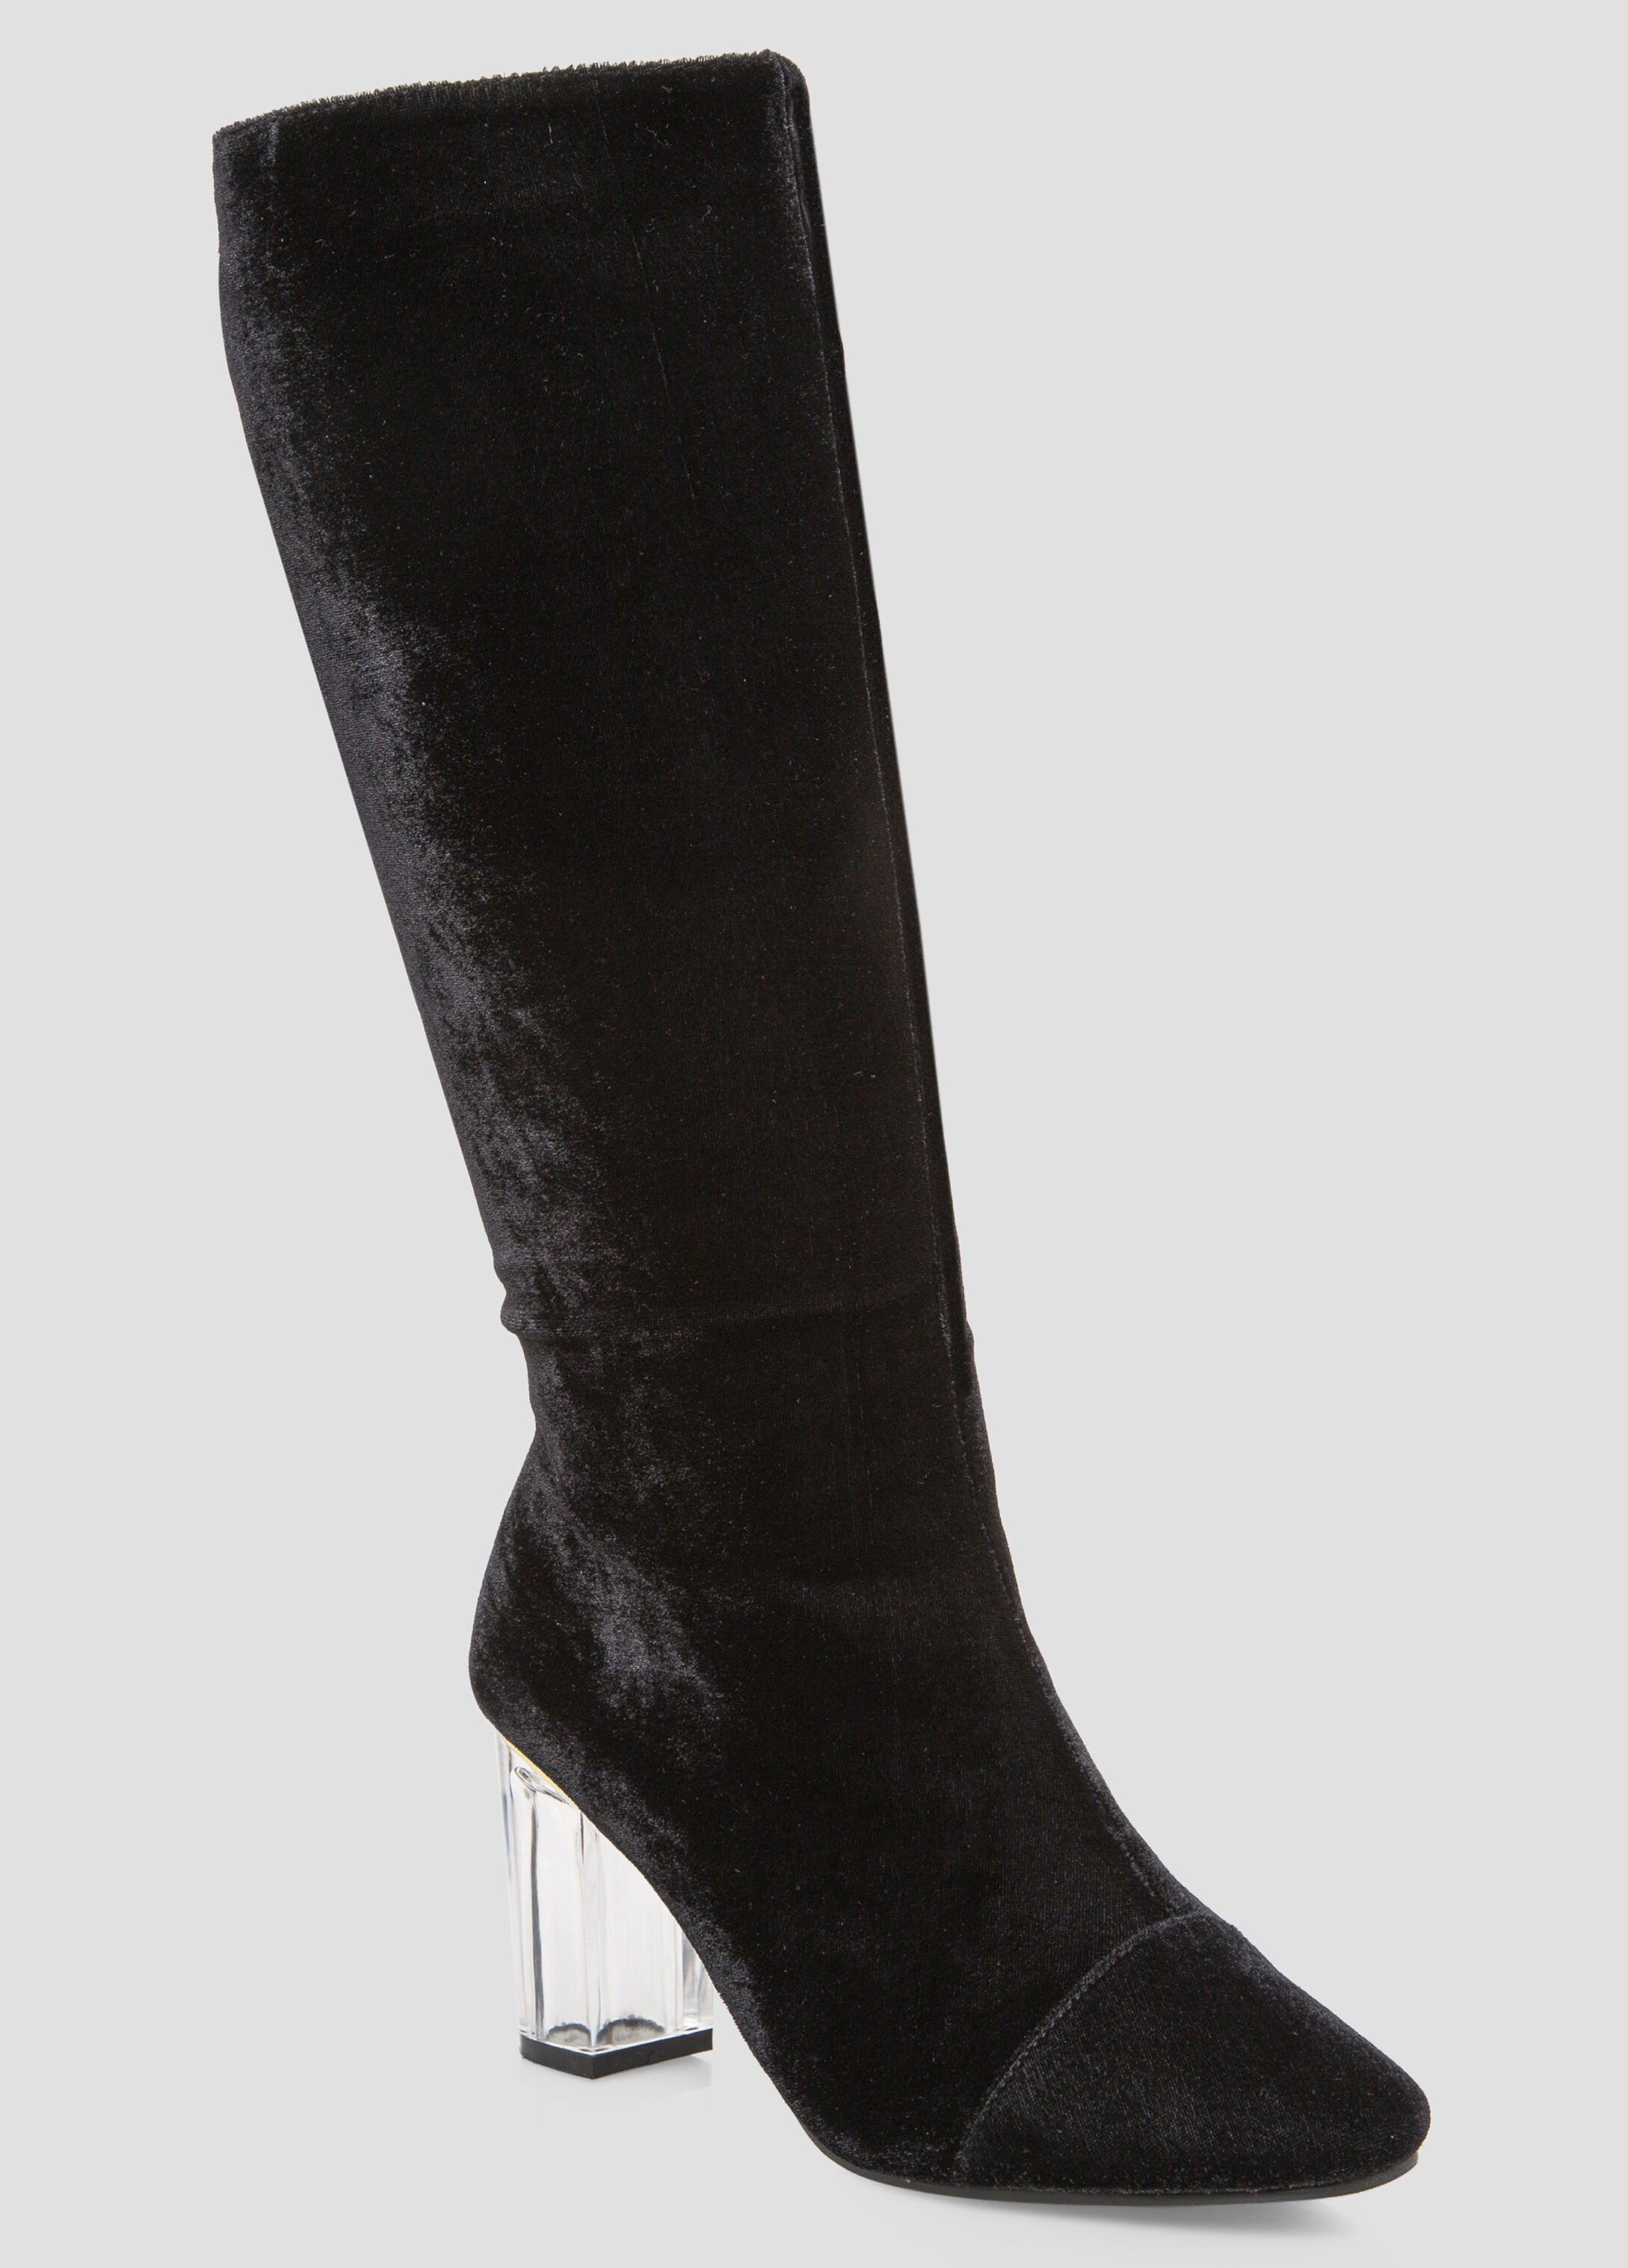 Velvet Lucite Knee High Boot - Wide Calf, Wide Width